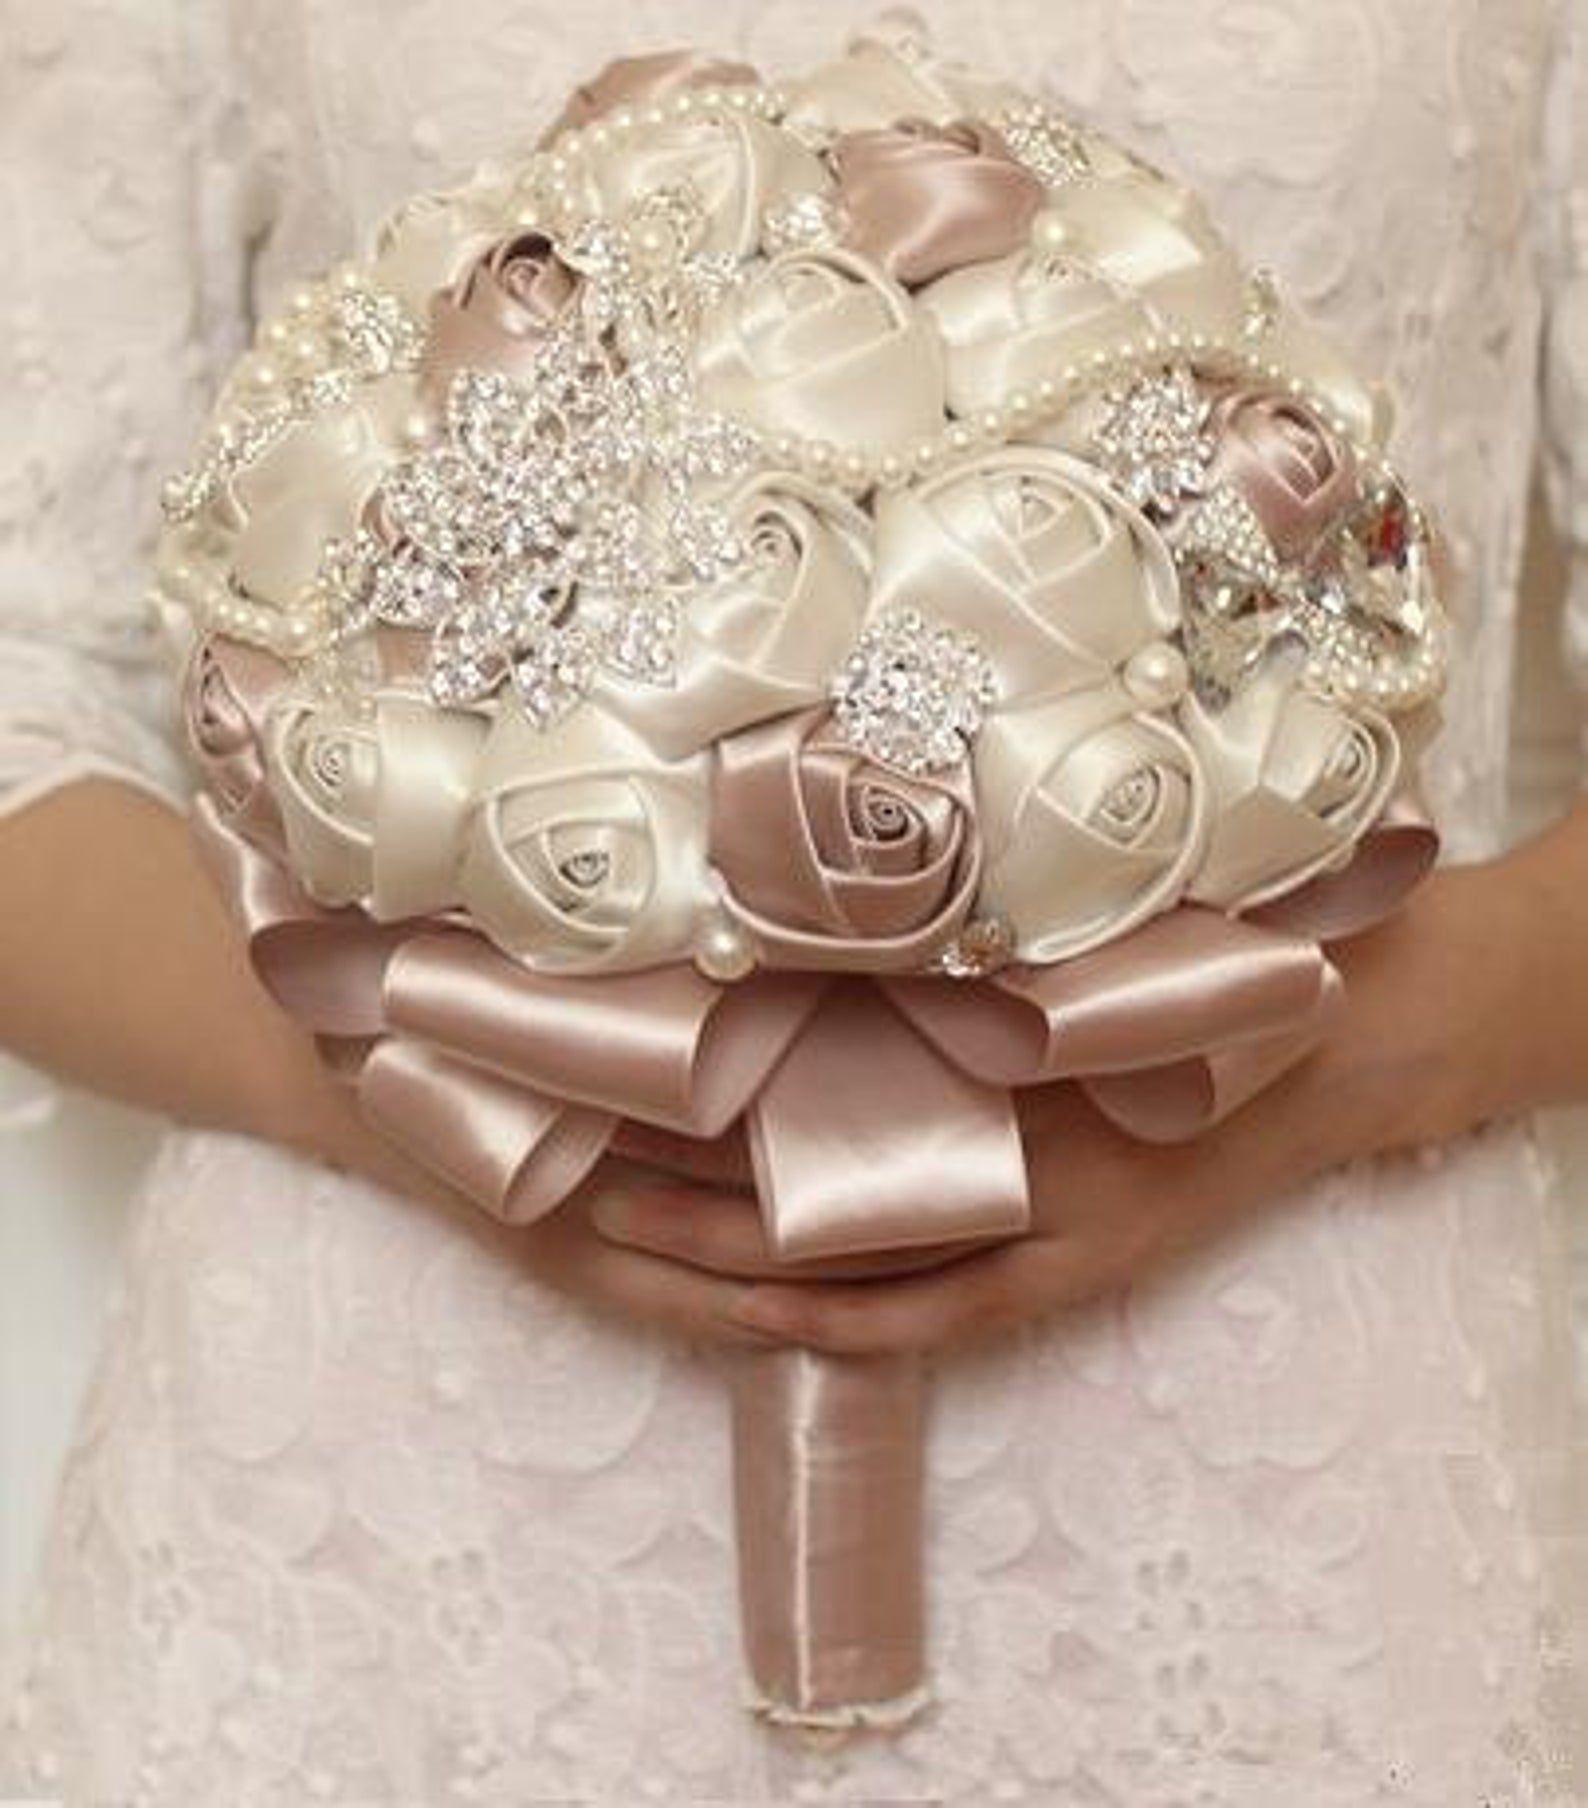 ON SALE Brooch bouquet wedding bouquet bridal bouquet